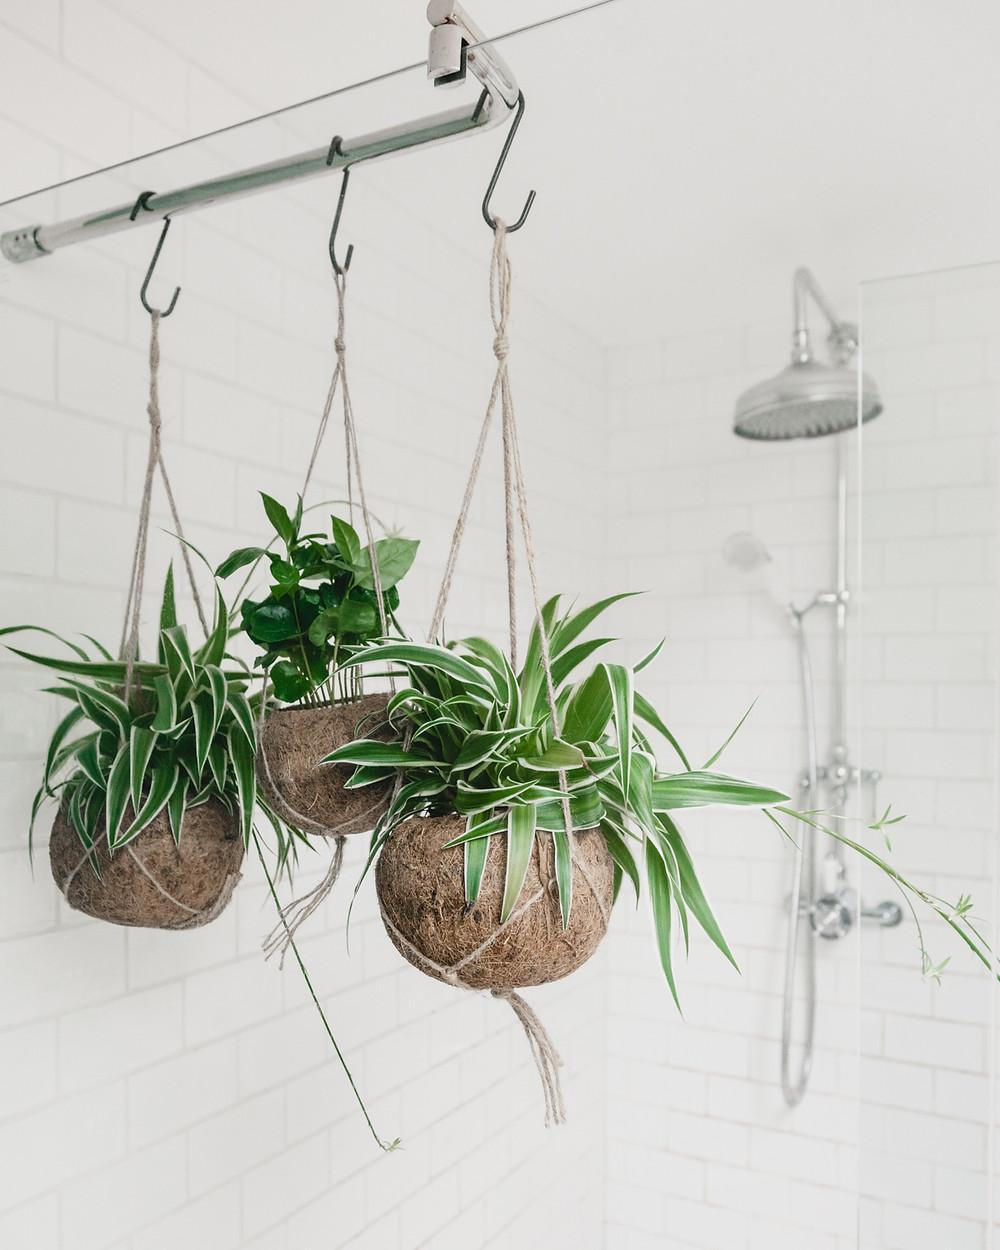 Kokedama planters